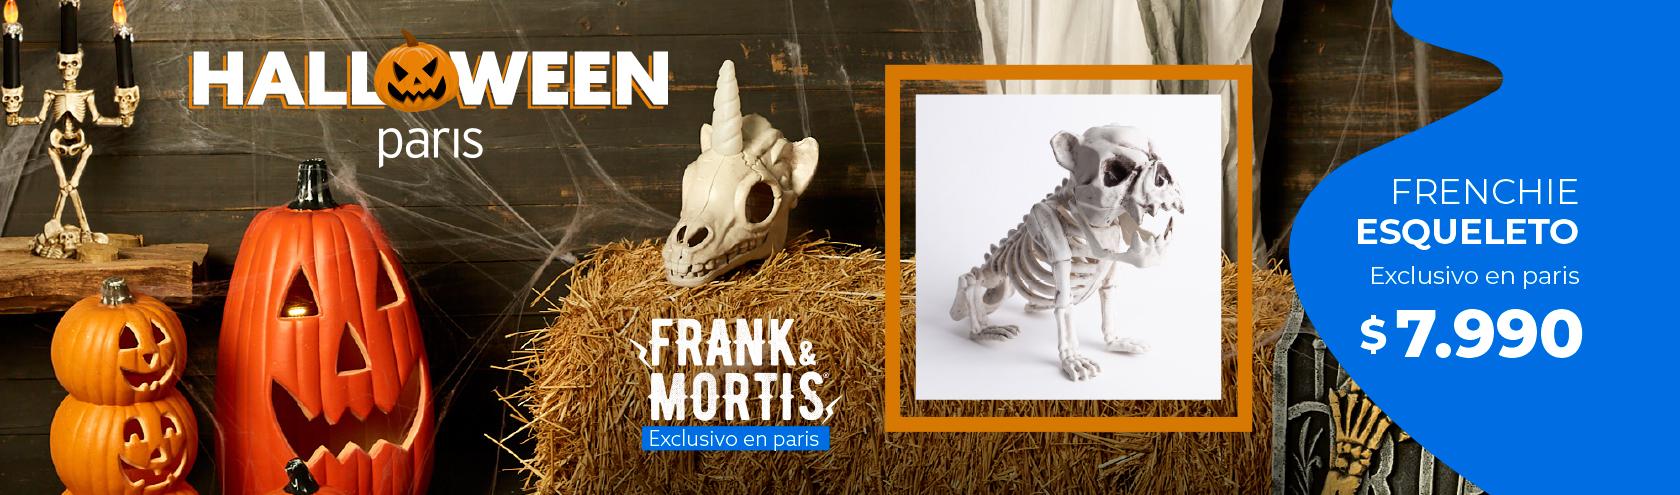 Frank & Mortis - Halloween en Paris.cl